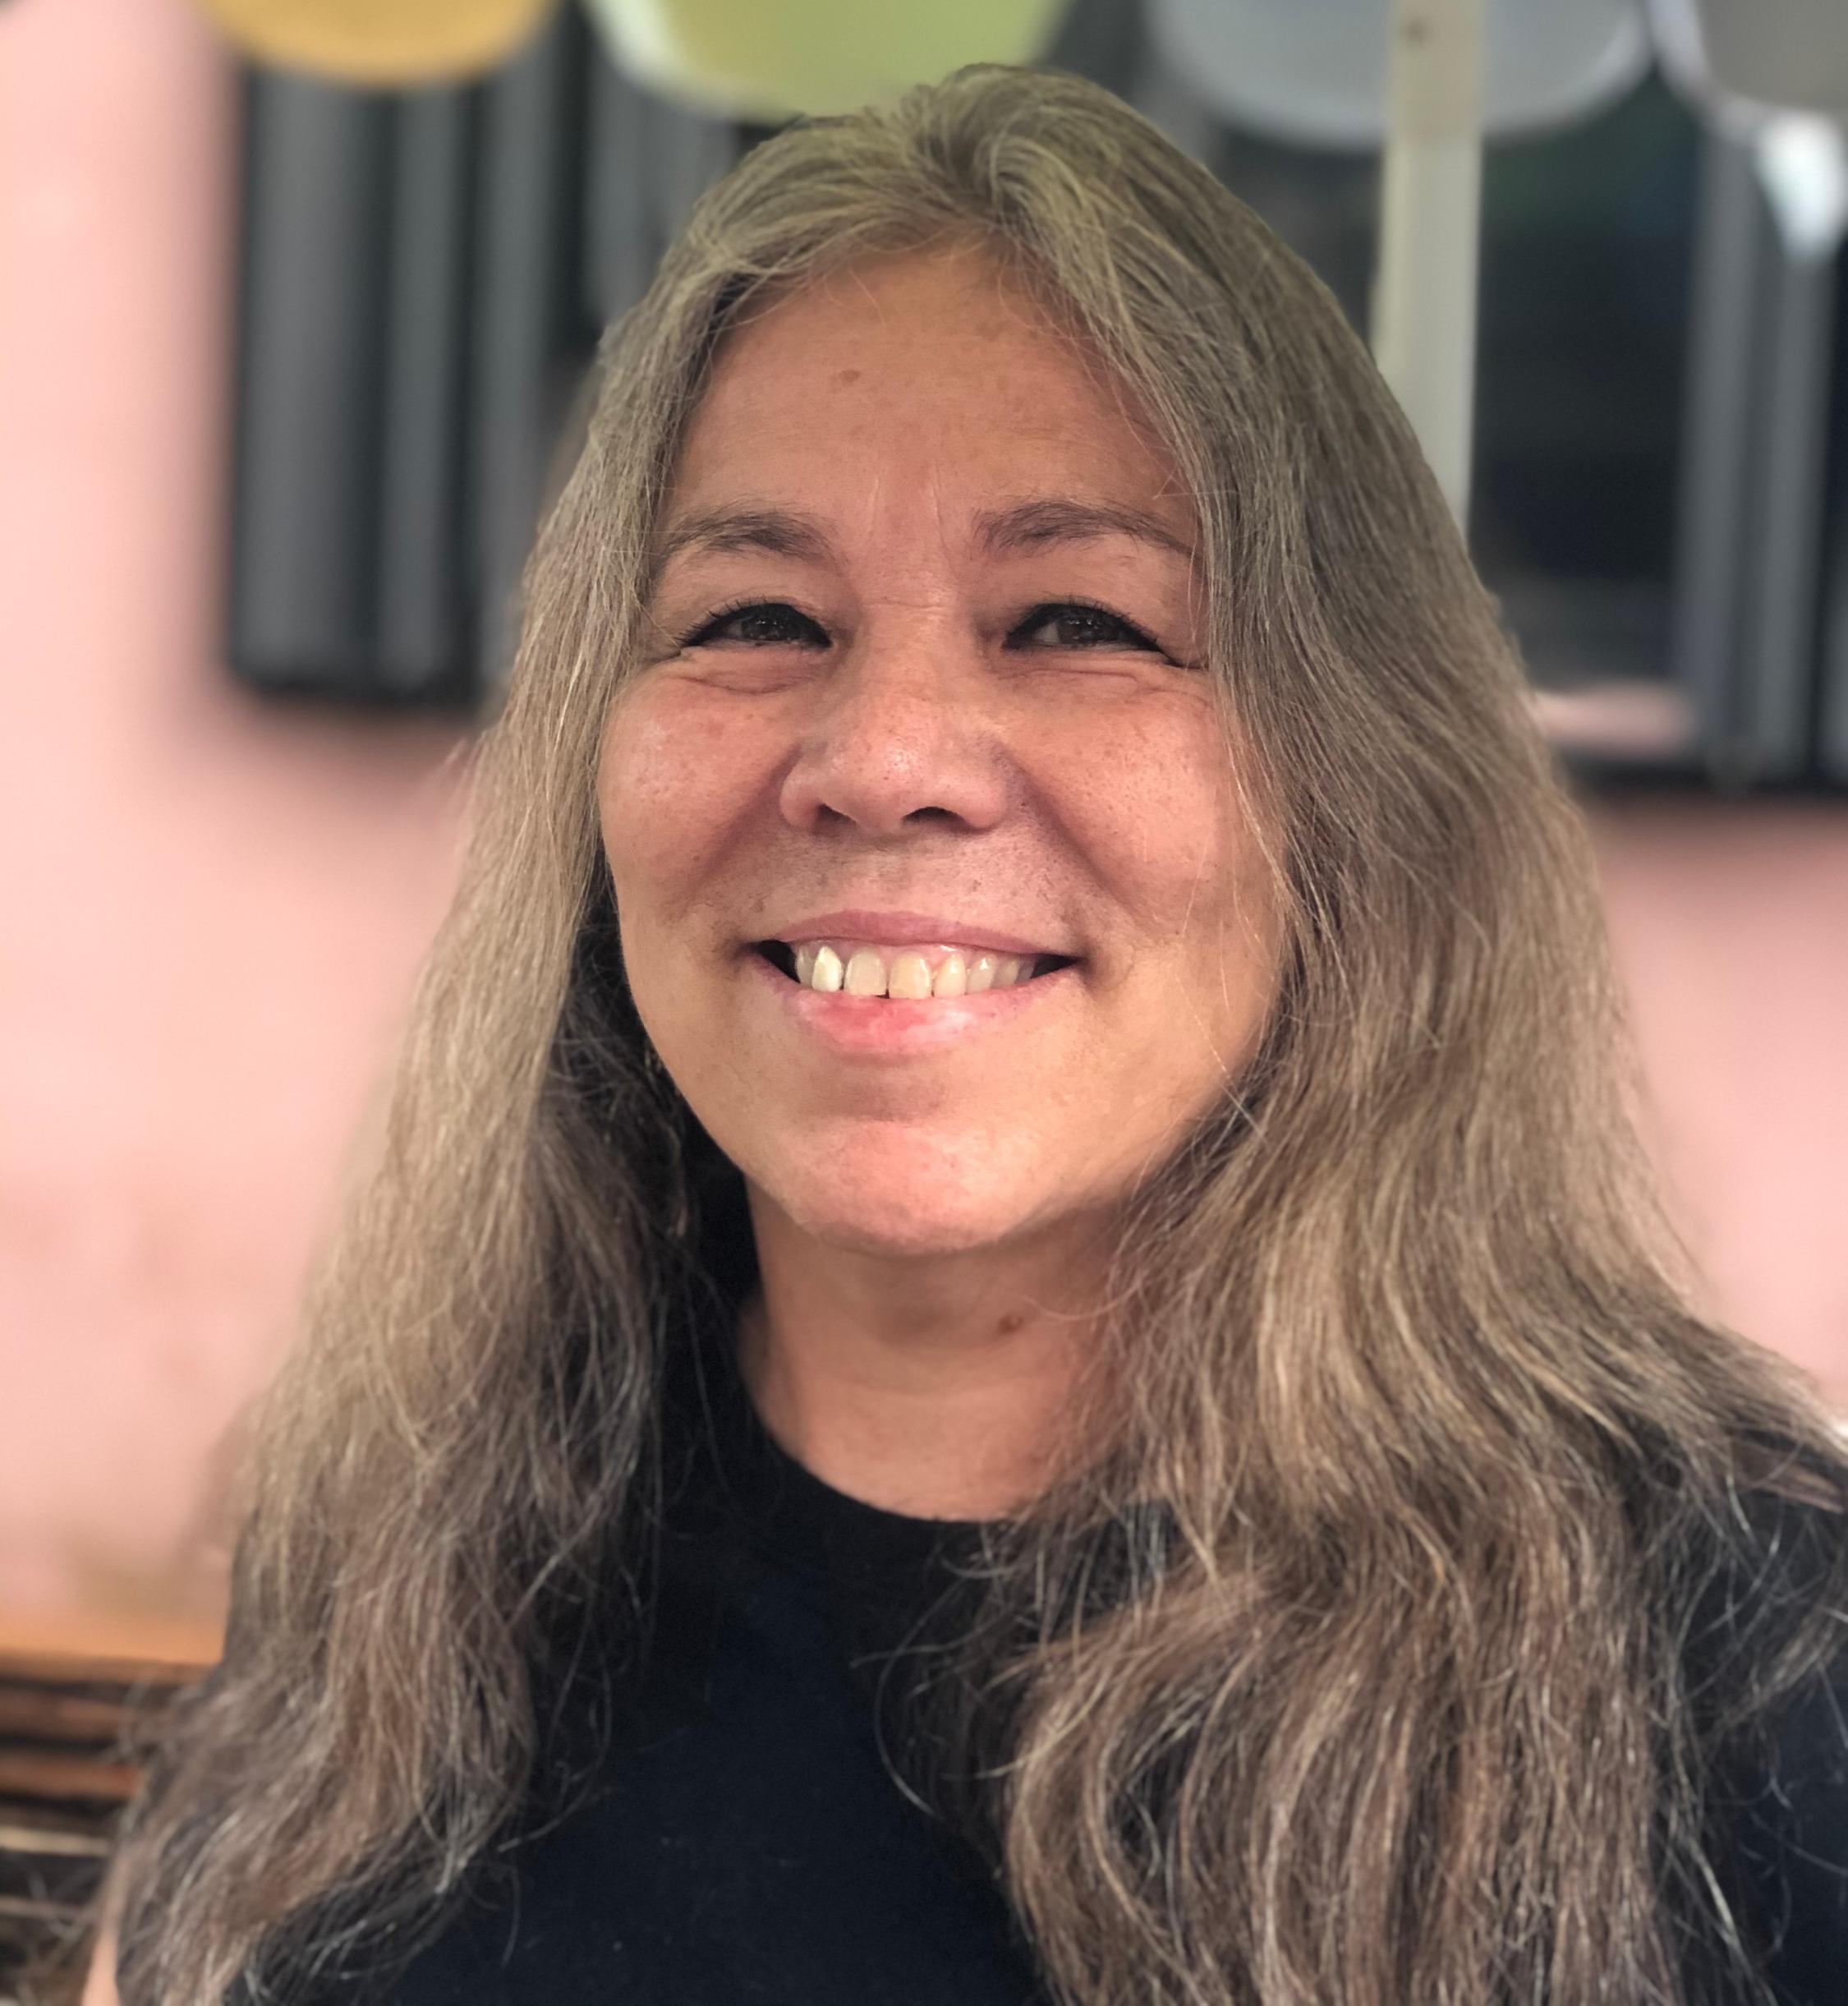 Darlene Pistocchi